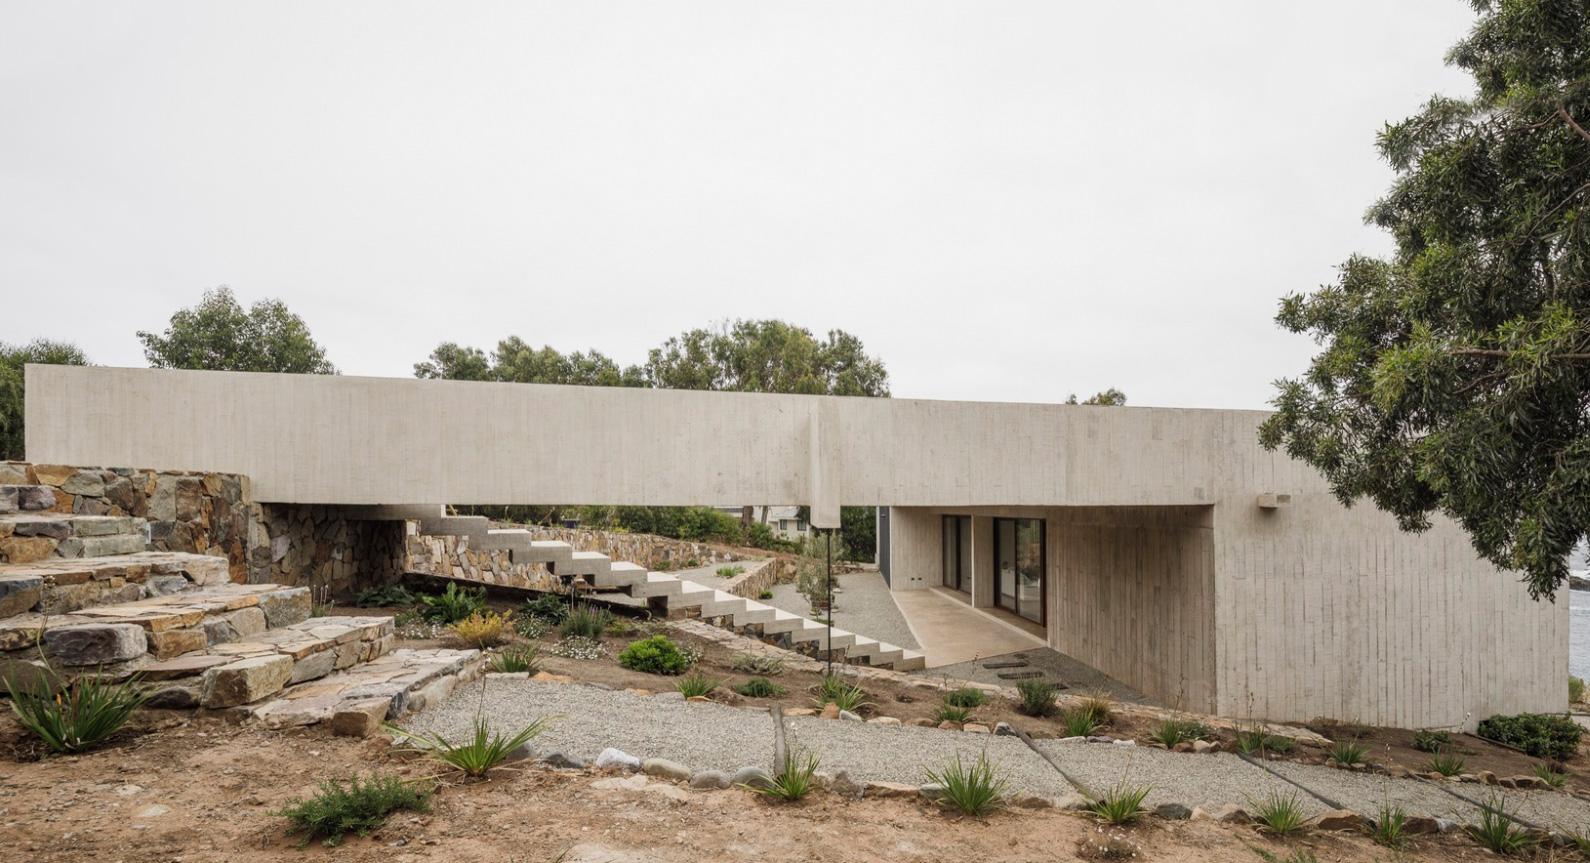 Casa Cipolla Is A Concrete Shelter Above Chile's Spectacular Coastline